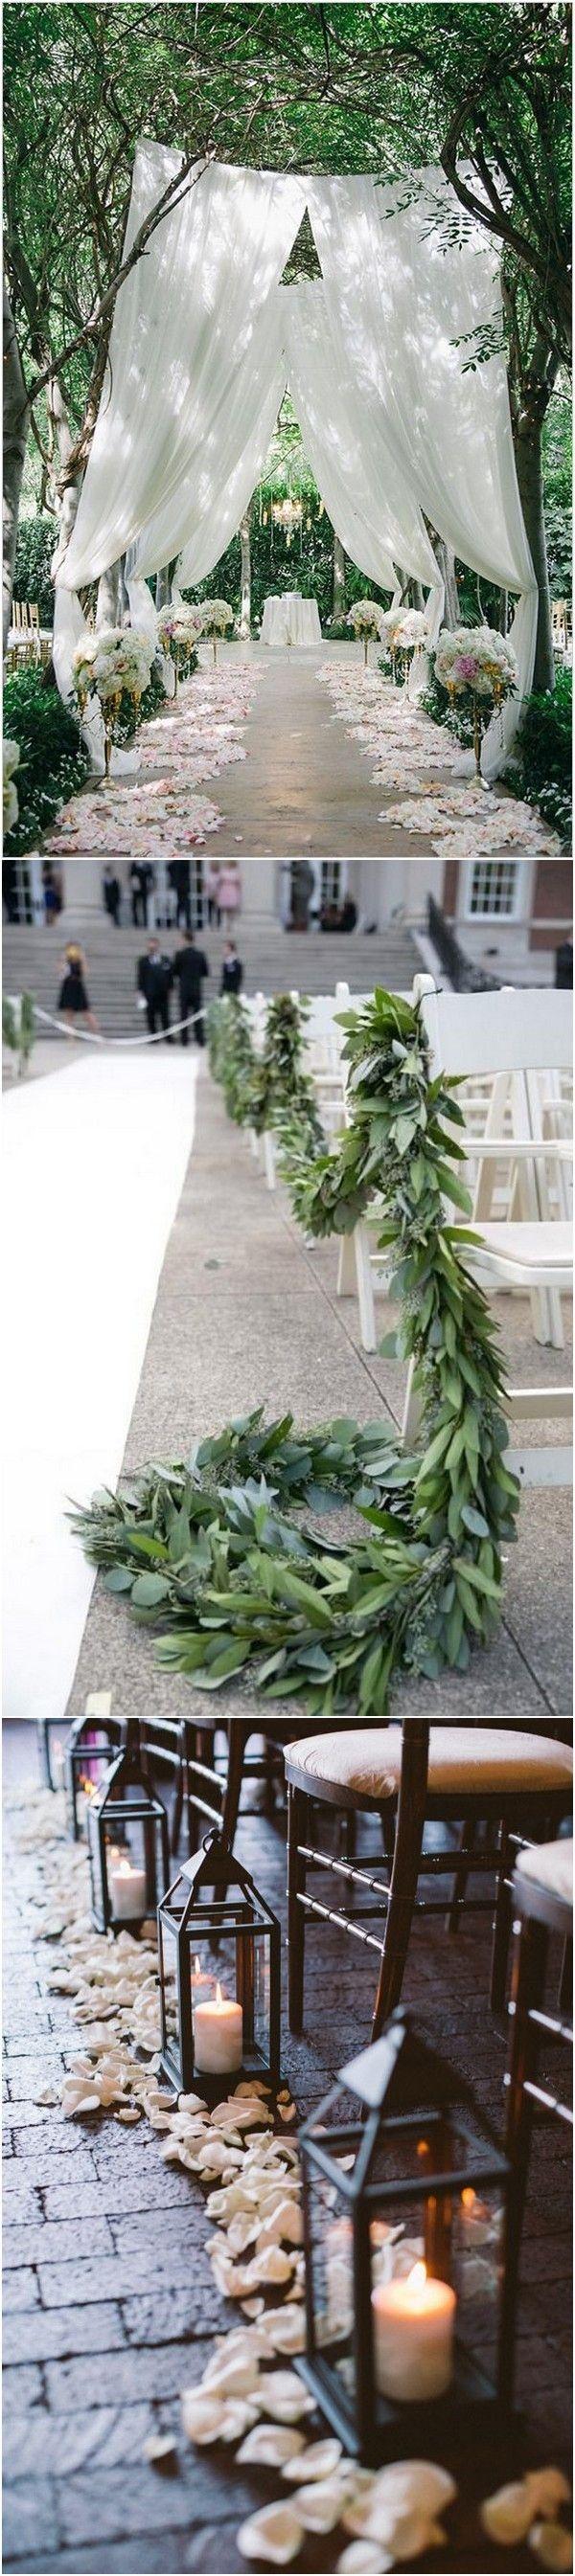 Wedding aisle decor ideas diy   Breathtaking Wedding Aisle Decoration Ideas to Steal  Whimsical